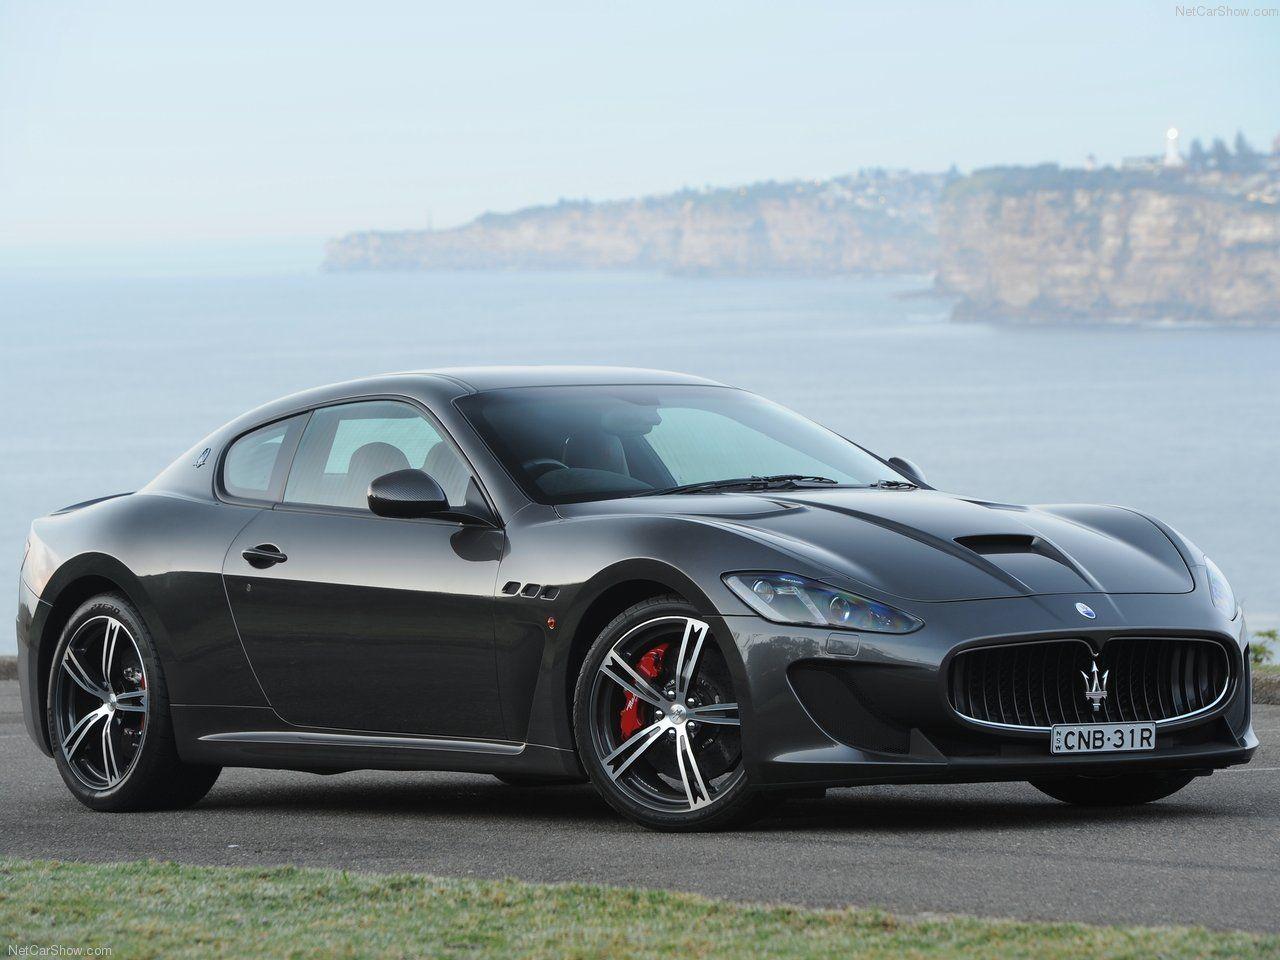 2014 Maserati Granturismo Mc Stradale New Pics « Car Blor Photo Gallery